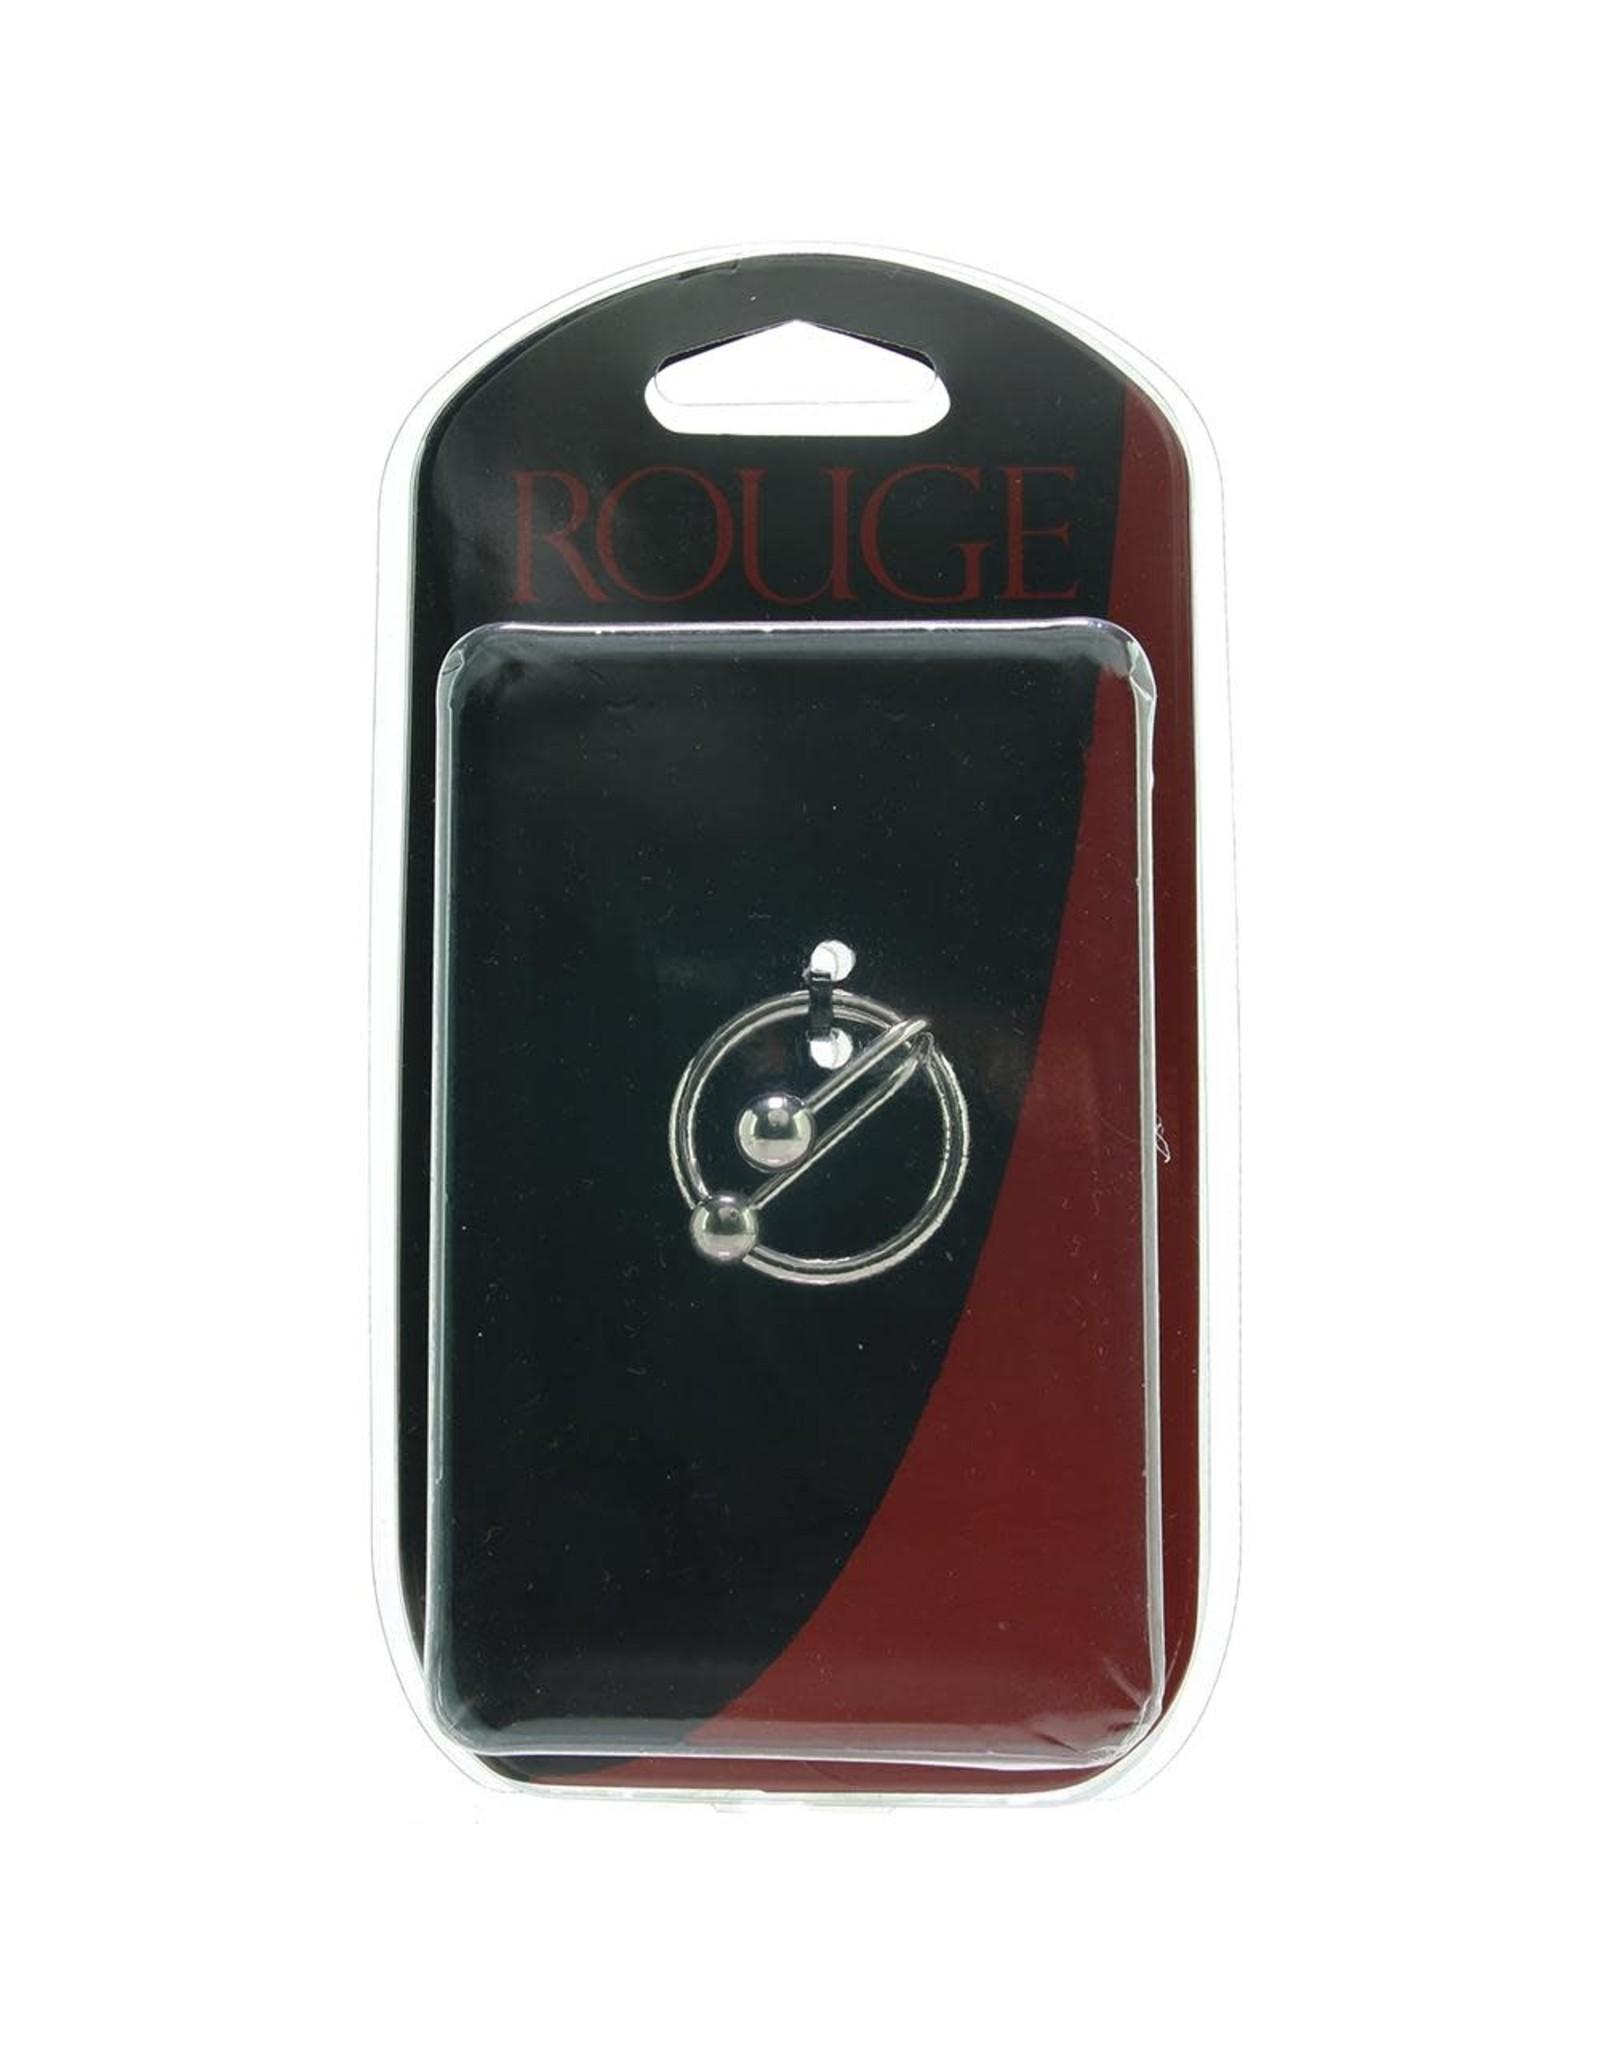 Rouge - Stainless Steel Sperm Stopper